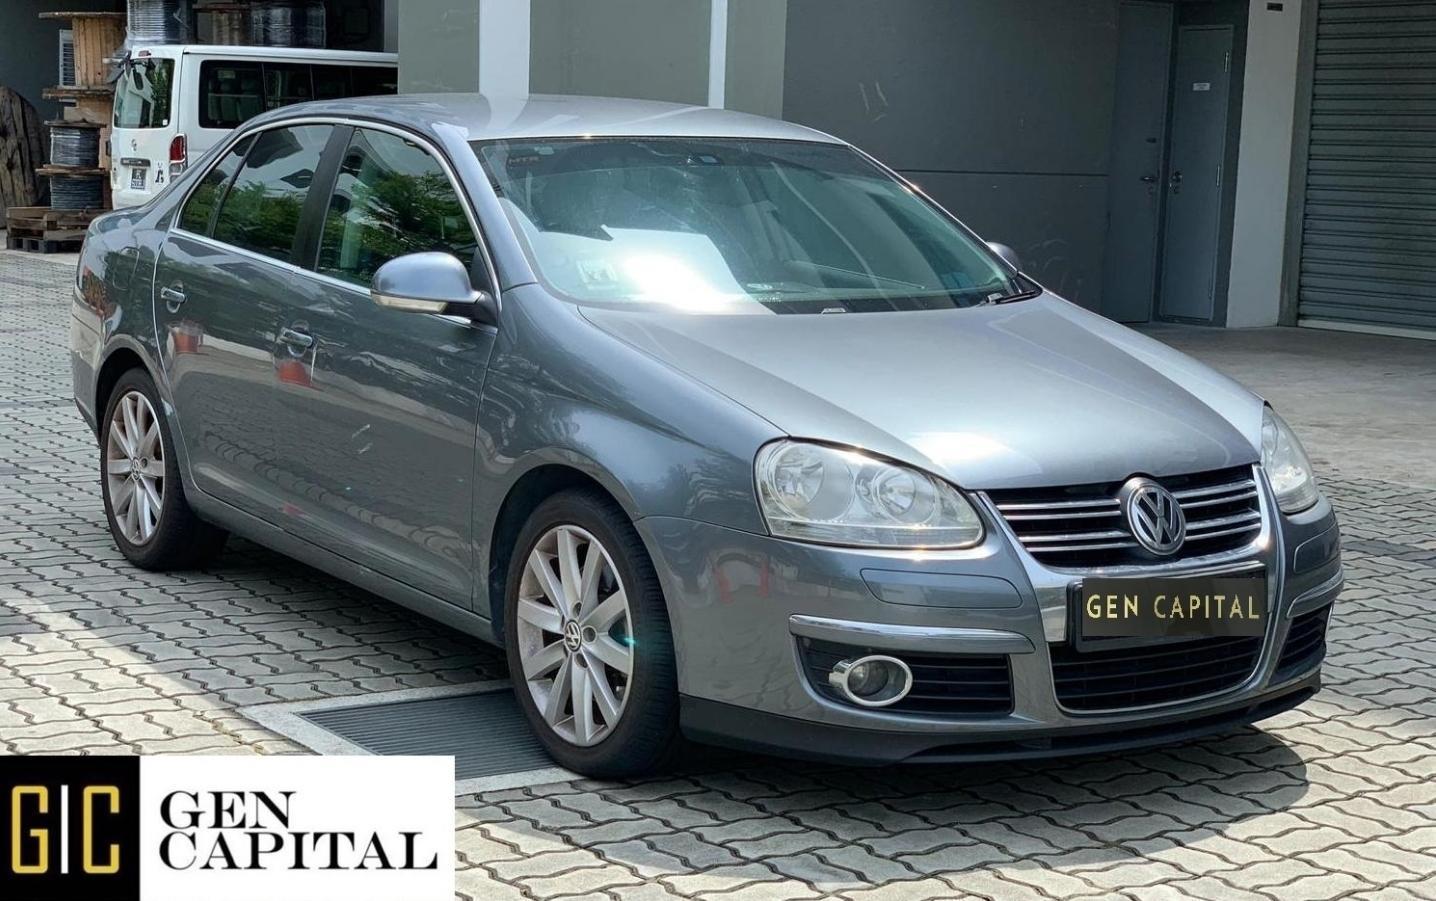 Volkswagen Jetta 1.4A TSI @ Cheapest rates, full support!